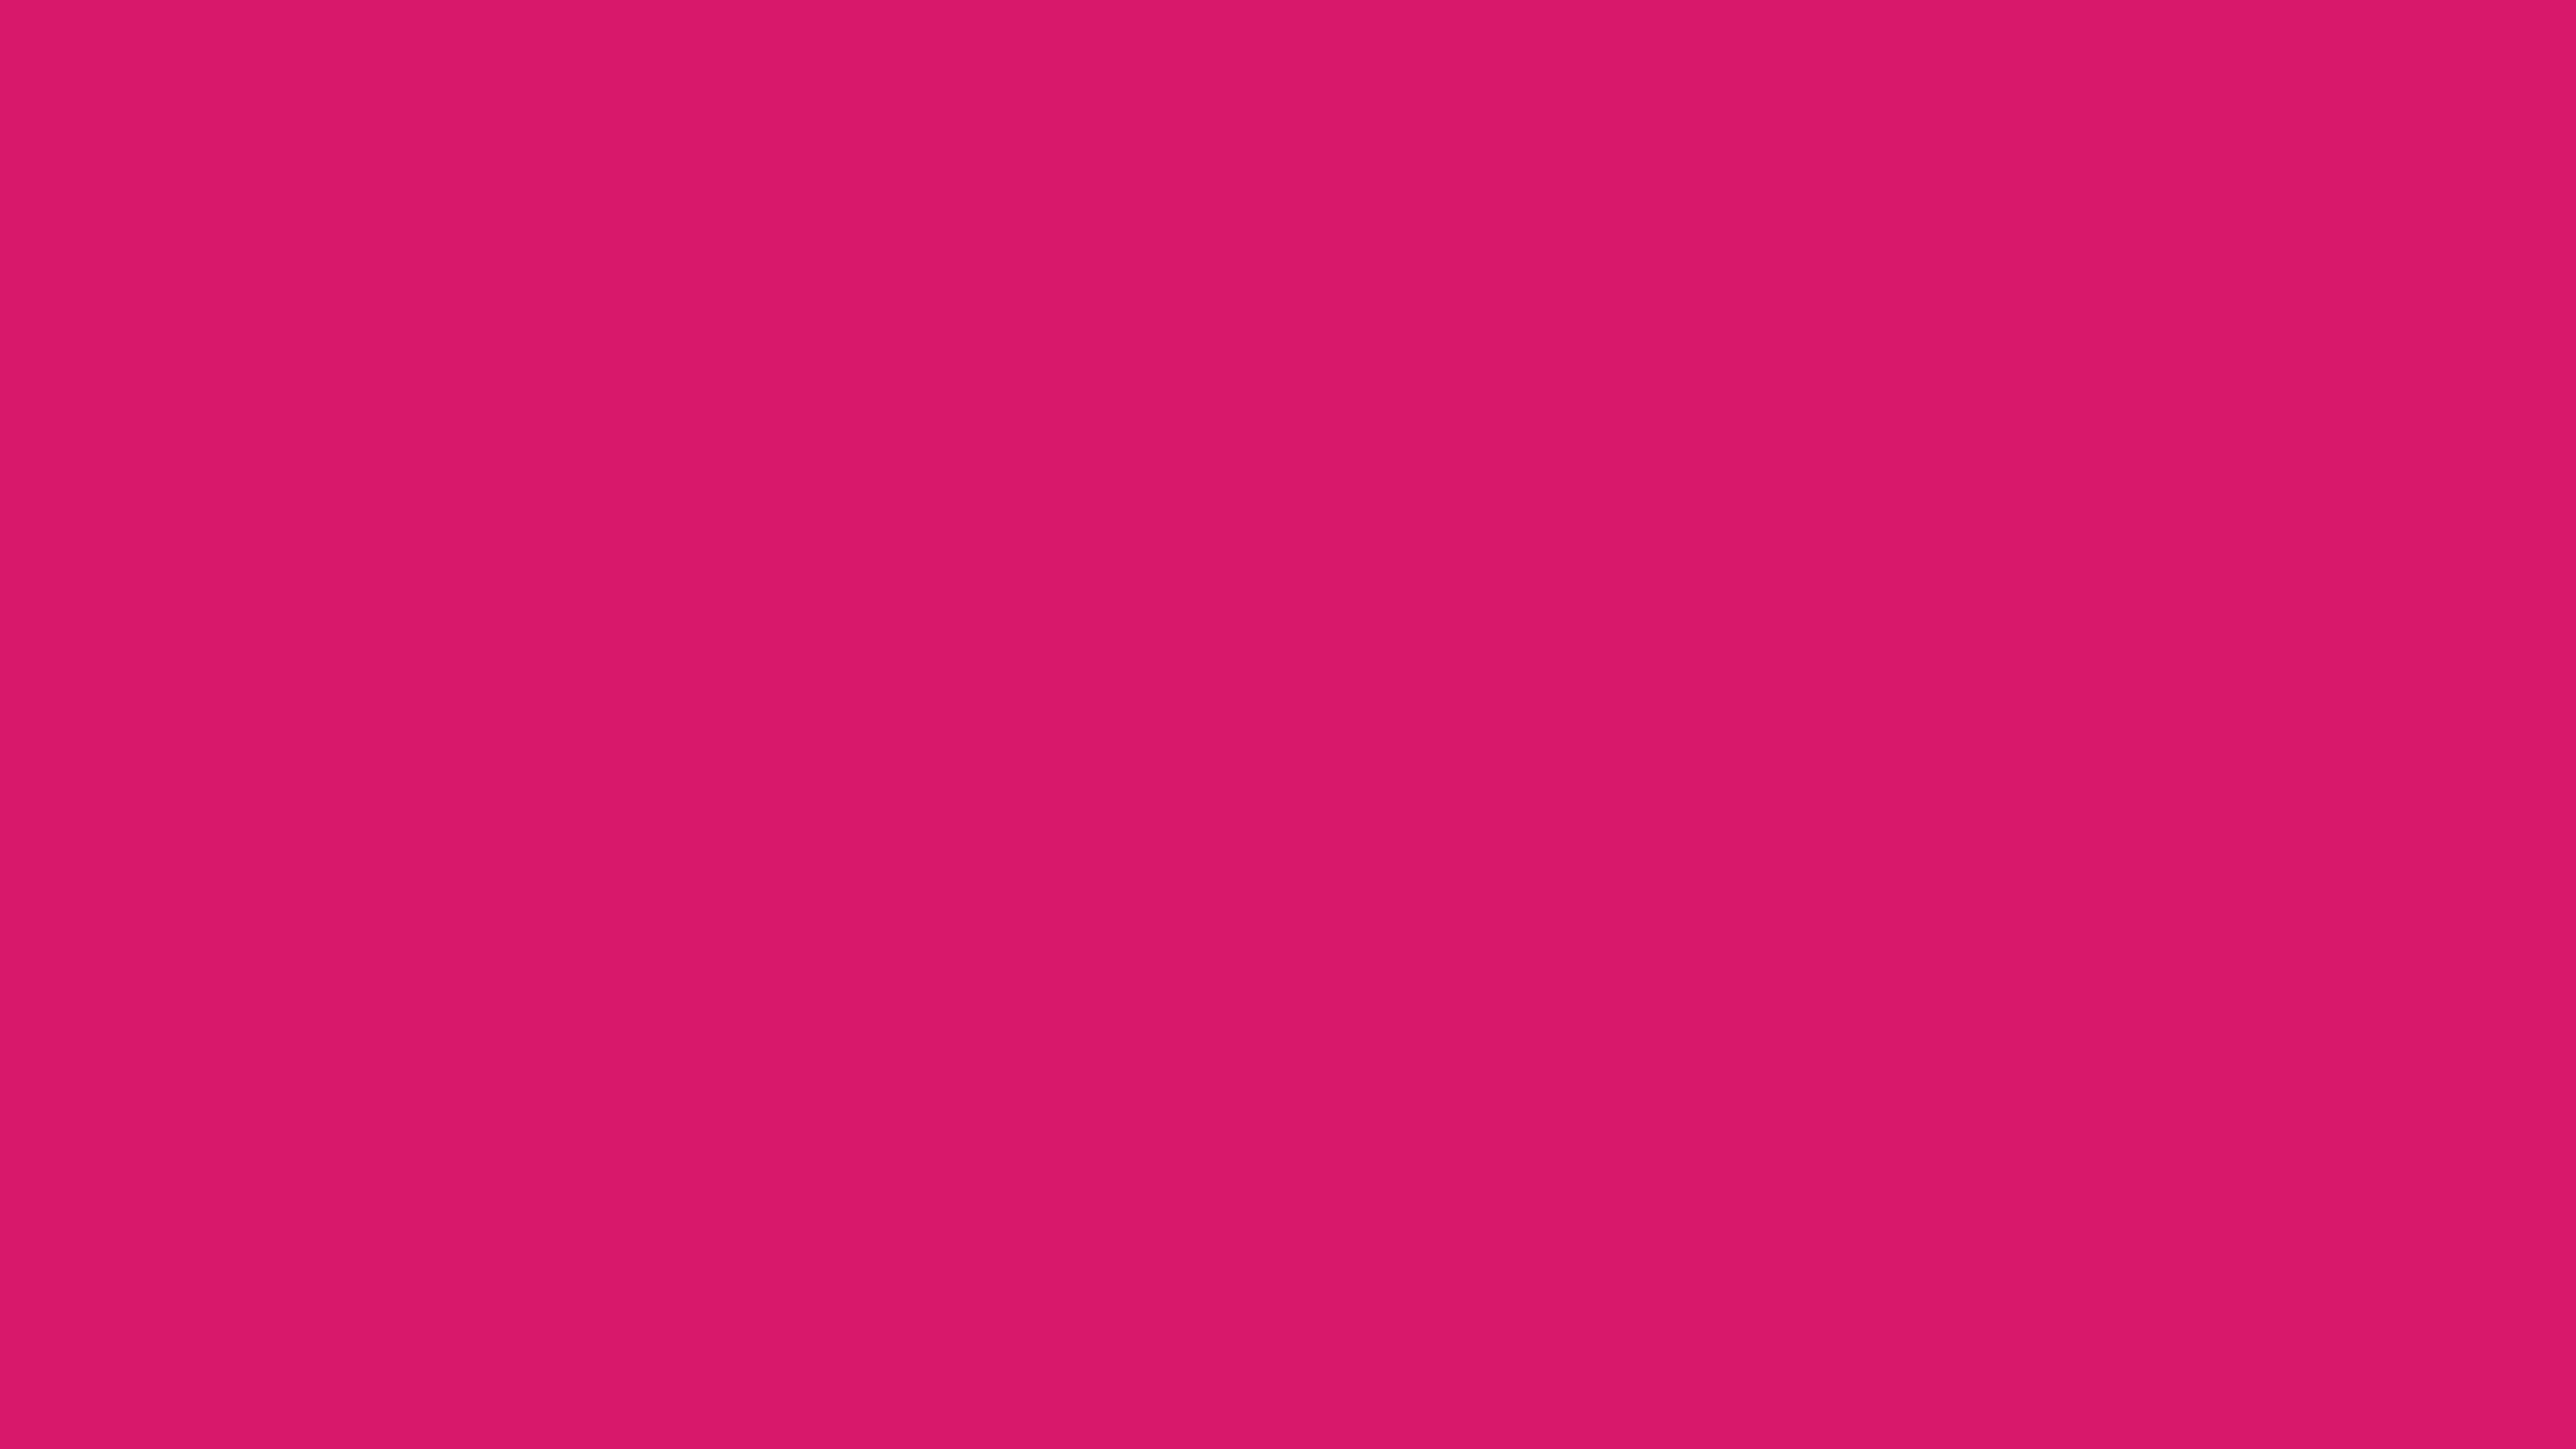 4096x2304 Dogwood Rose Solid Color Background